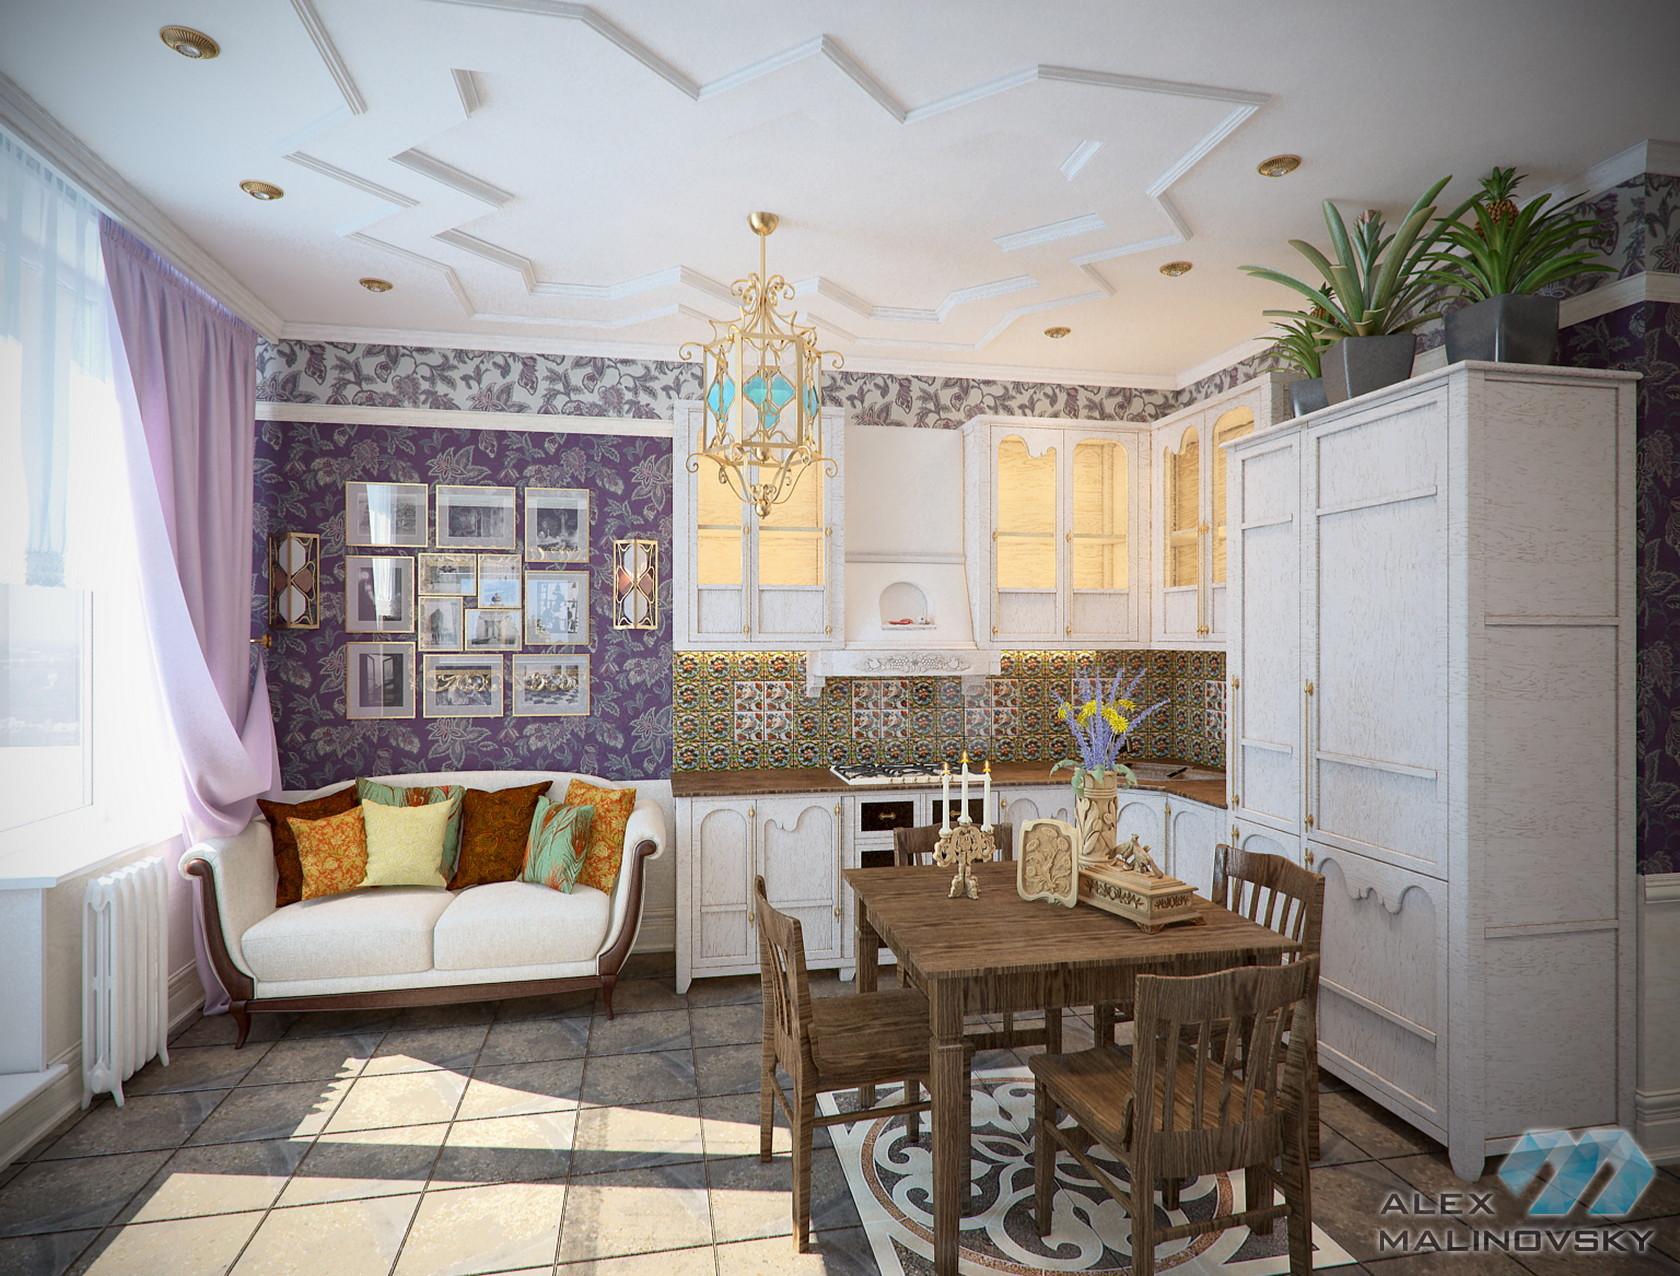 Кухня, 2х комнатная квартира, ЖК Веллтонпарк, Москва